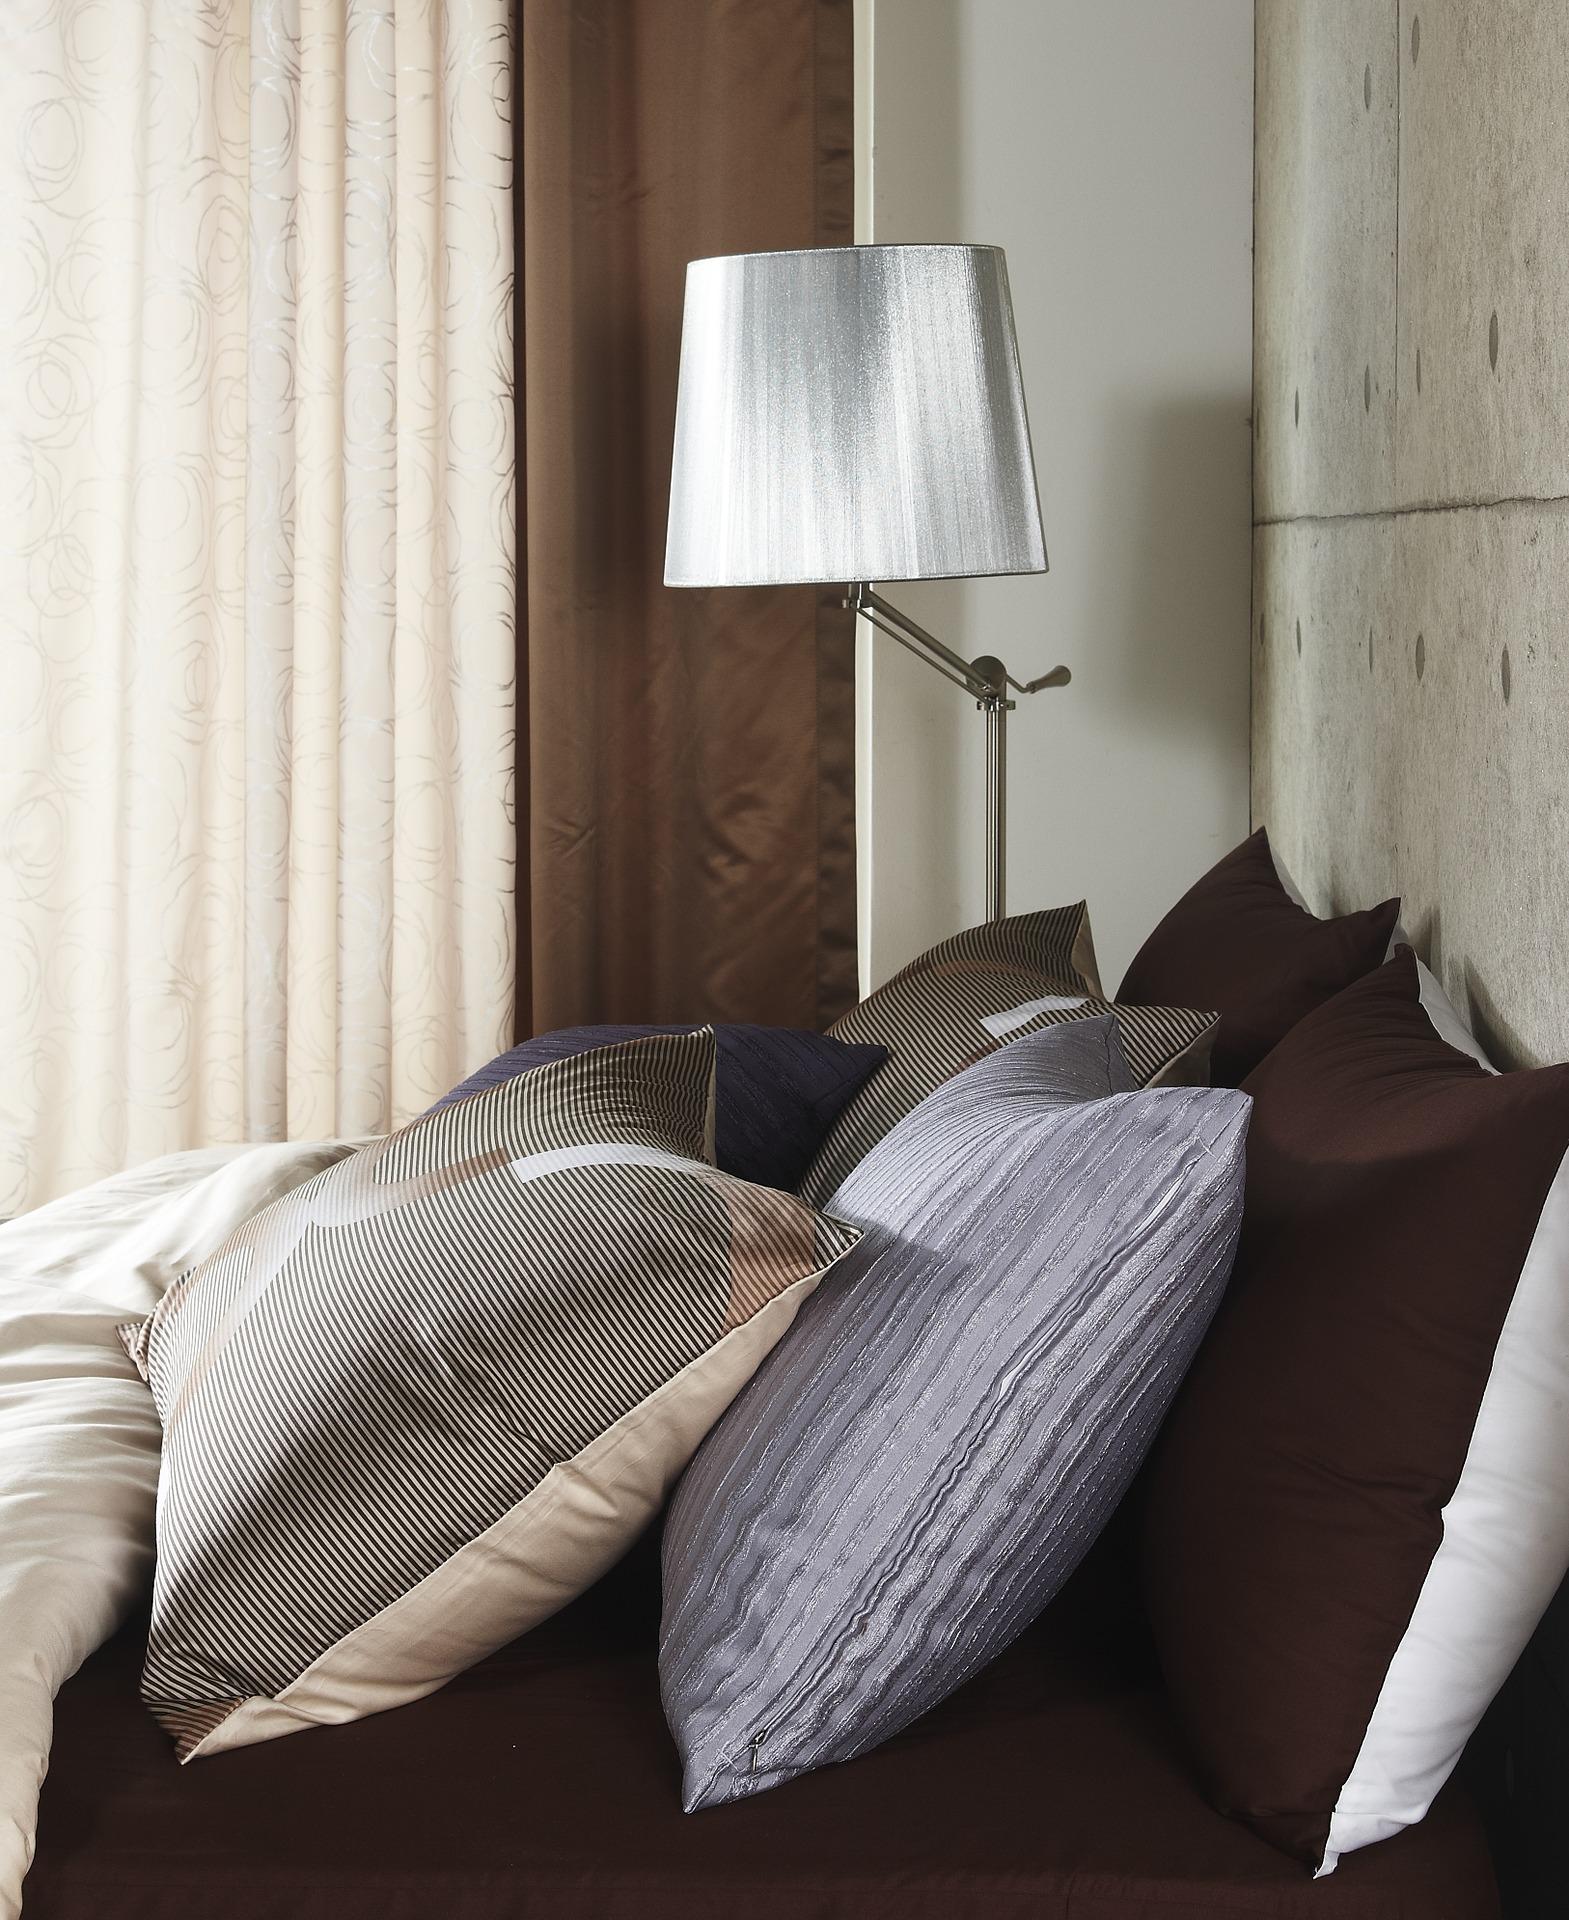 cushion-1164143_1920